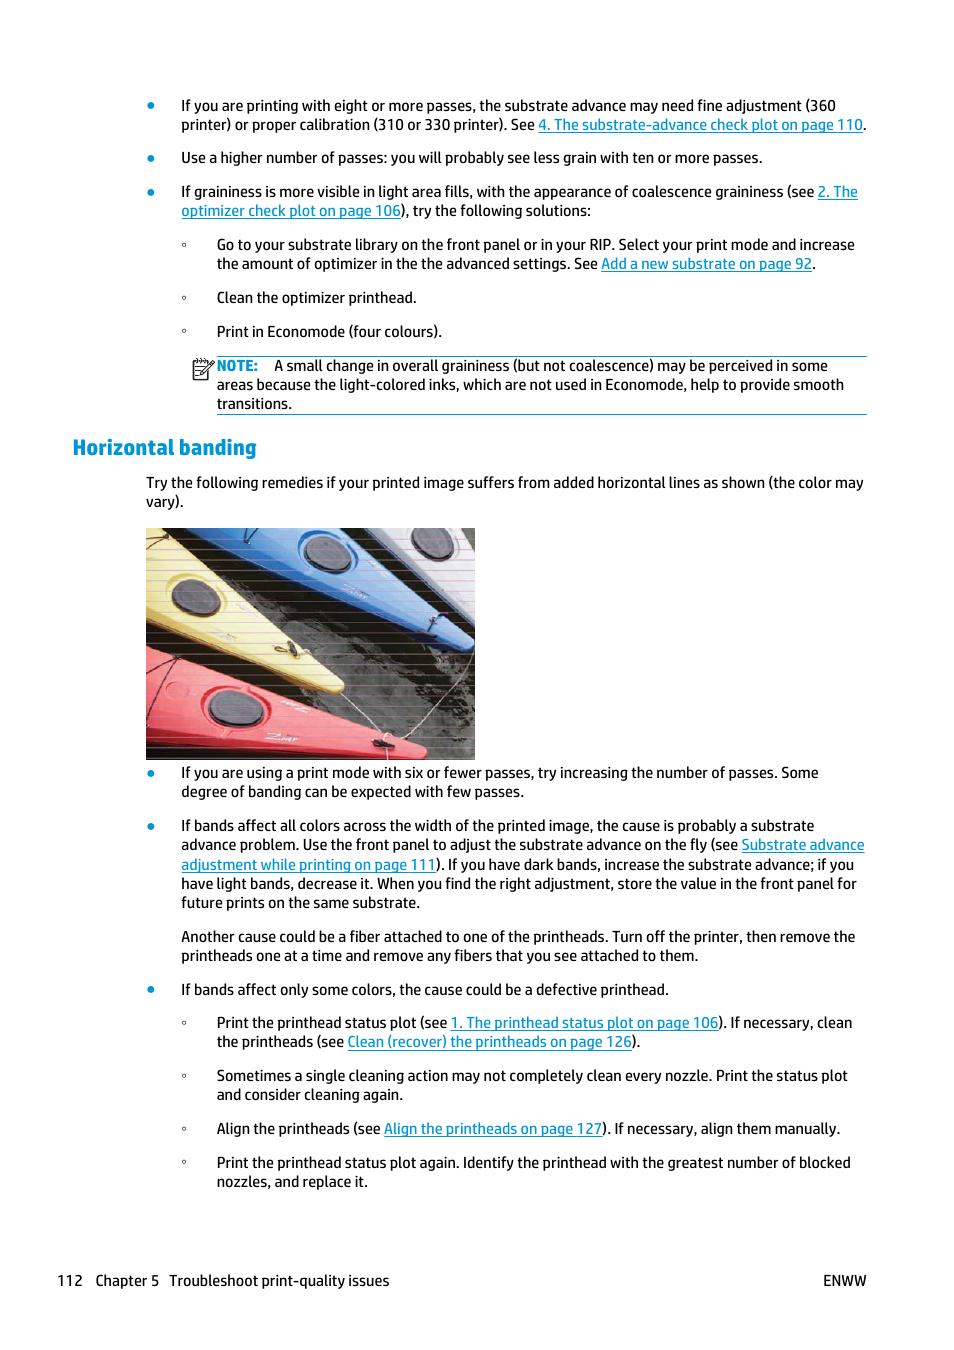 Horizontal banding | HP Latex 360 Printer User Manual | Page